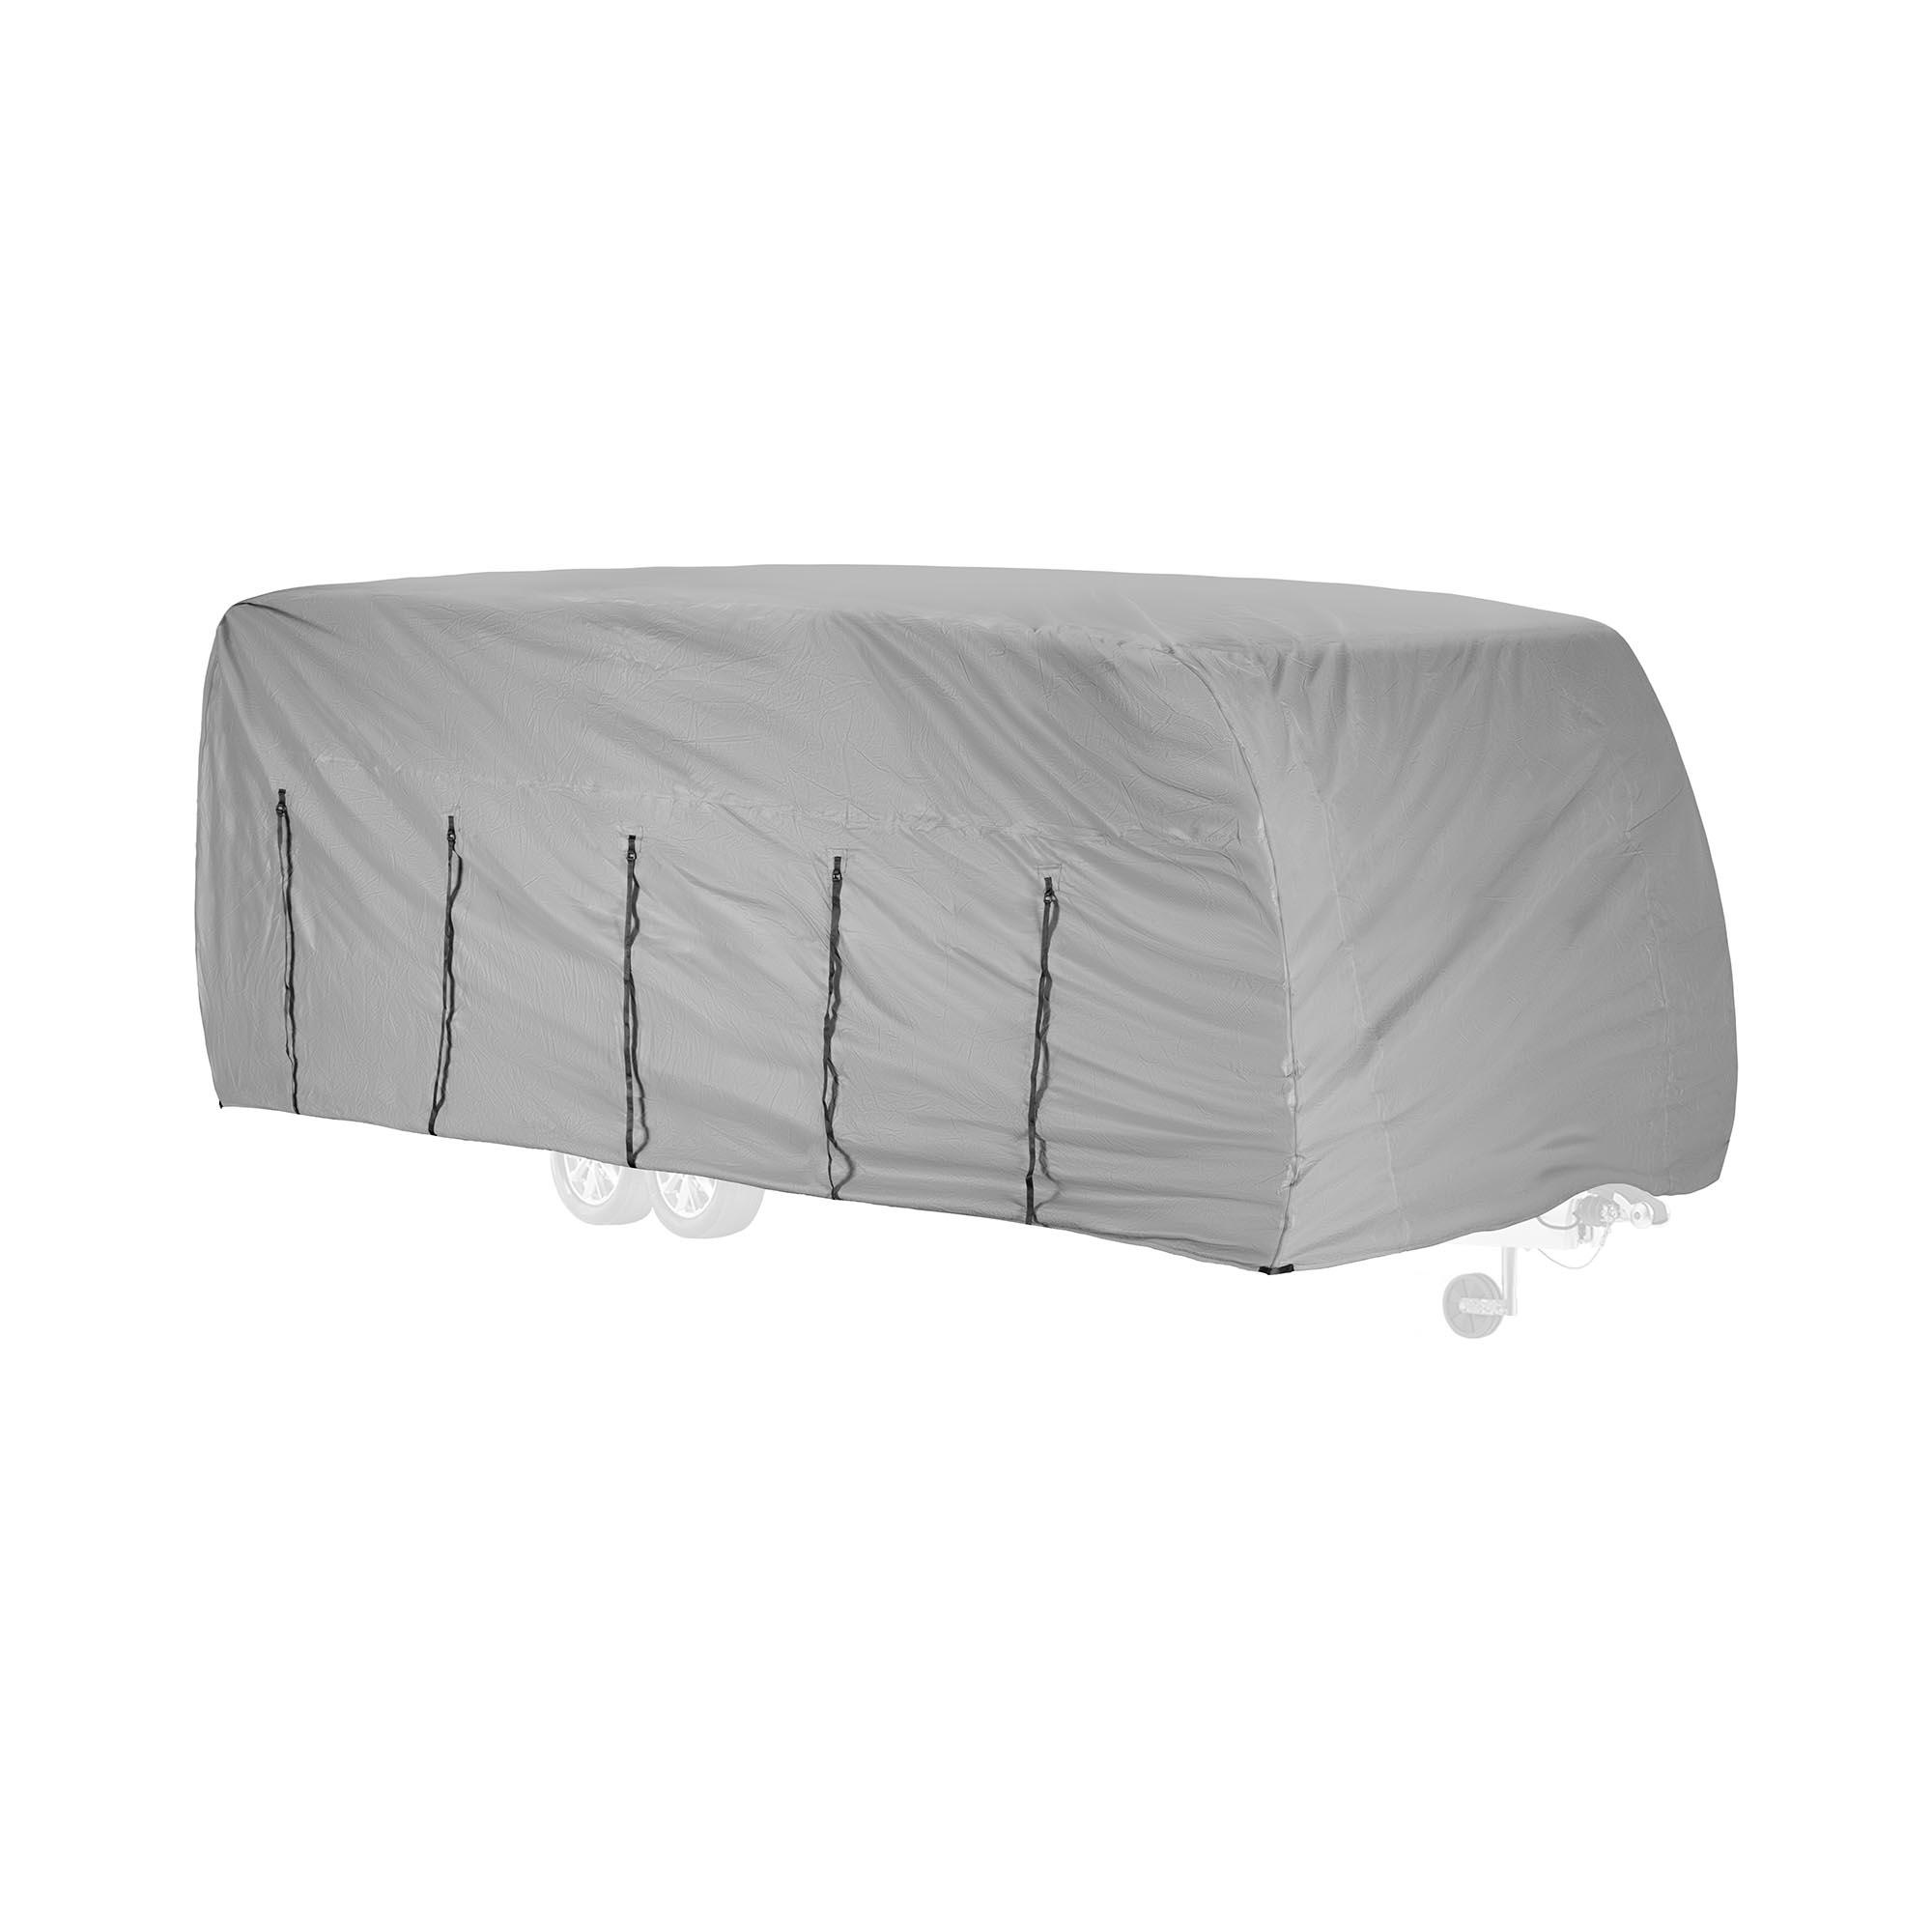 MSW Wohnmobil Schutzhülle - 550 x 230 x 250 cm MSW-CC-550-130